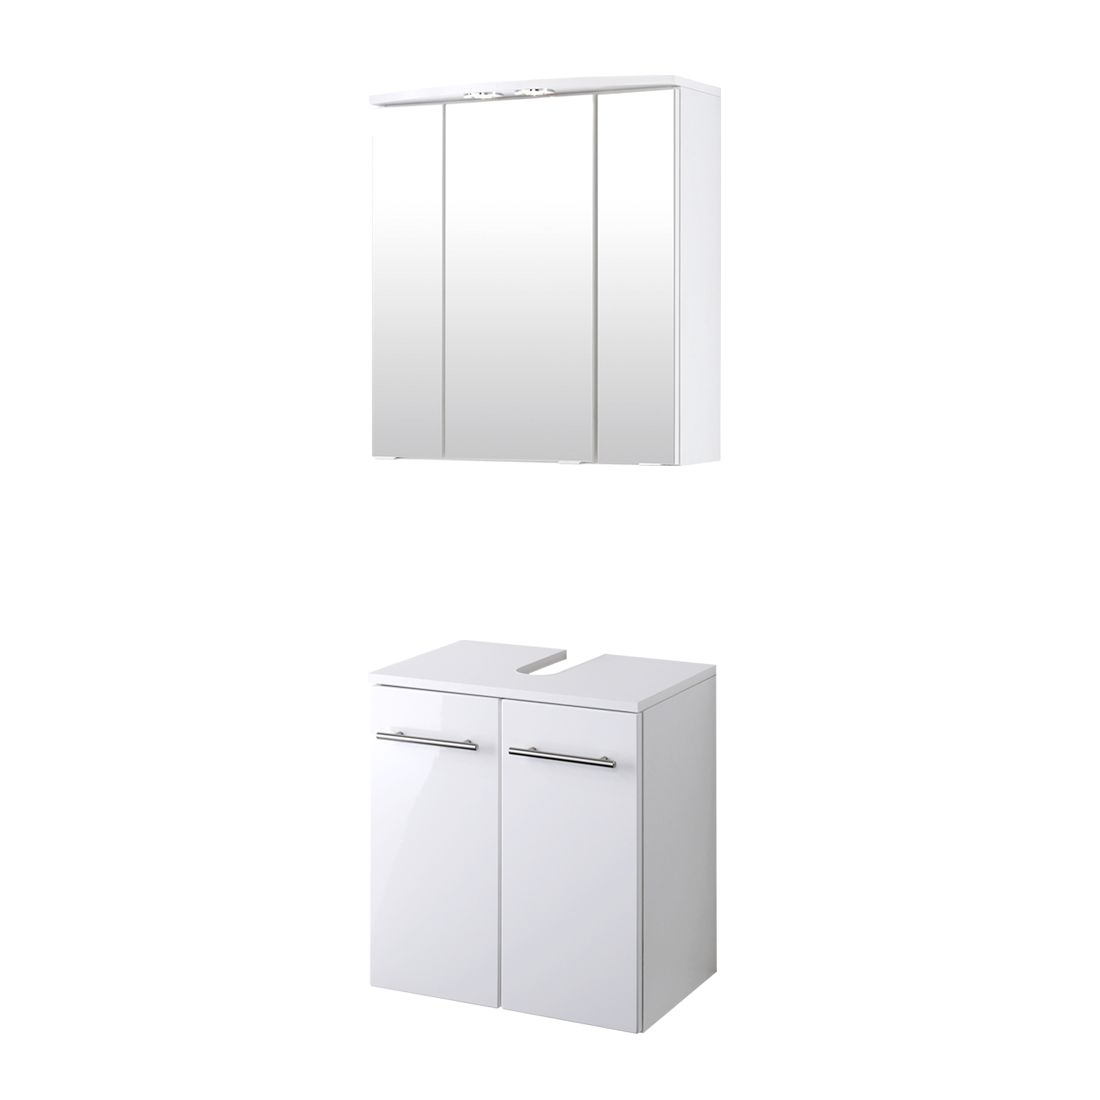 Home 24 - Meuble lavabo kopenhagen - blanc brillant / blanc, giessbach